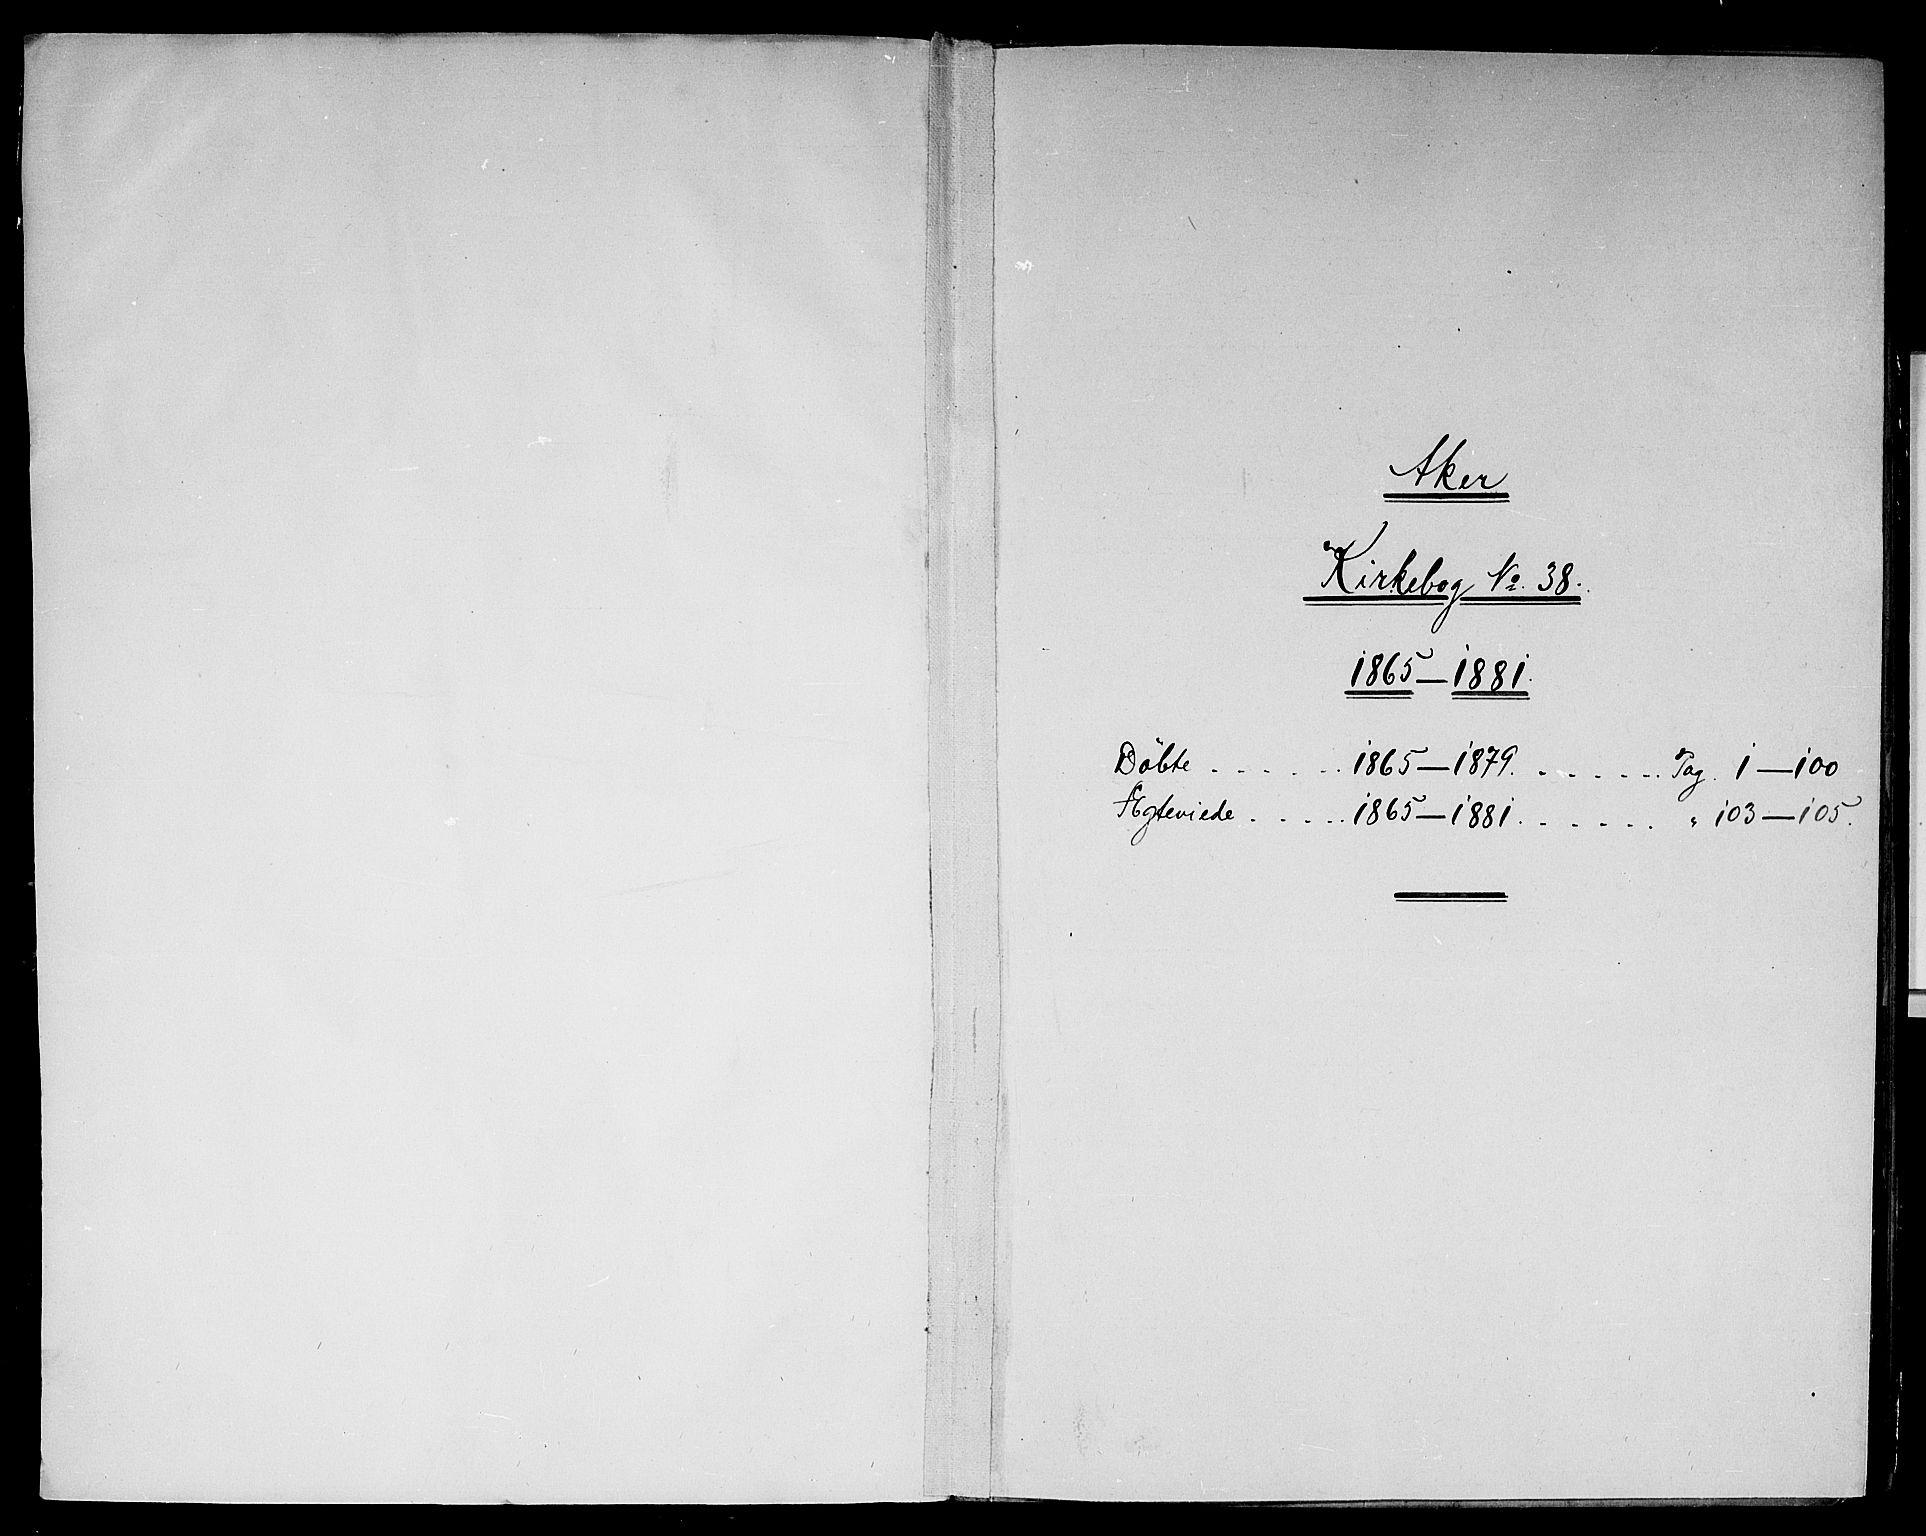 SAO, Vestre Aker prestekontor Kirkebøker, G/Gb/L0001: Klokkerbok nr. II 1, 1865-1881